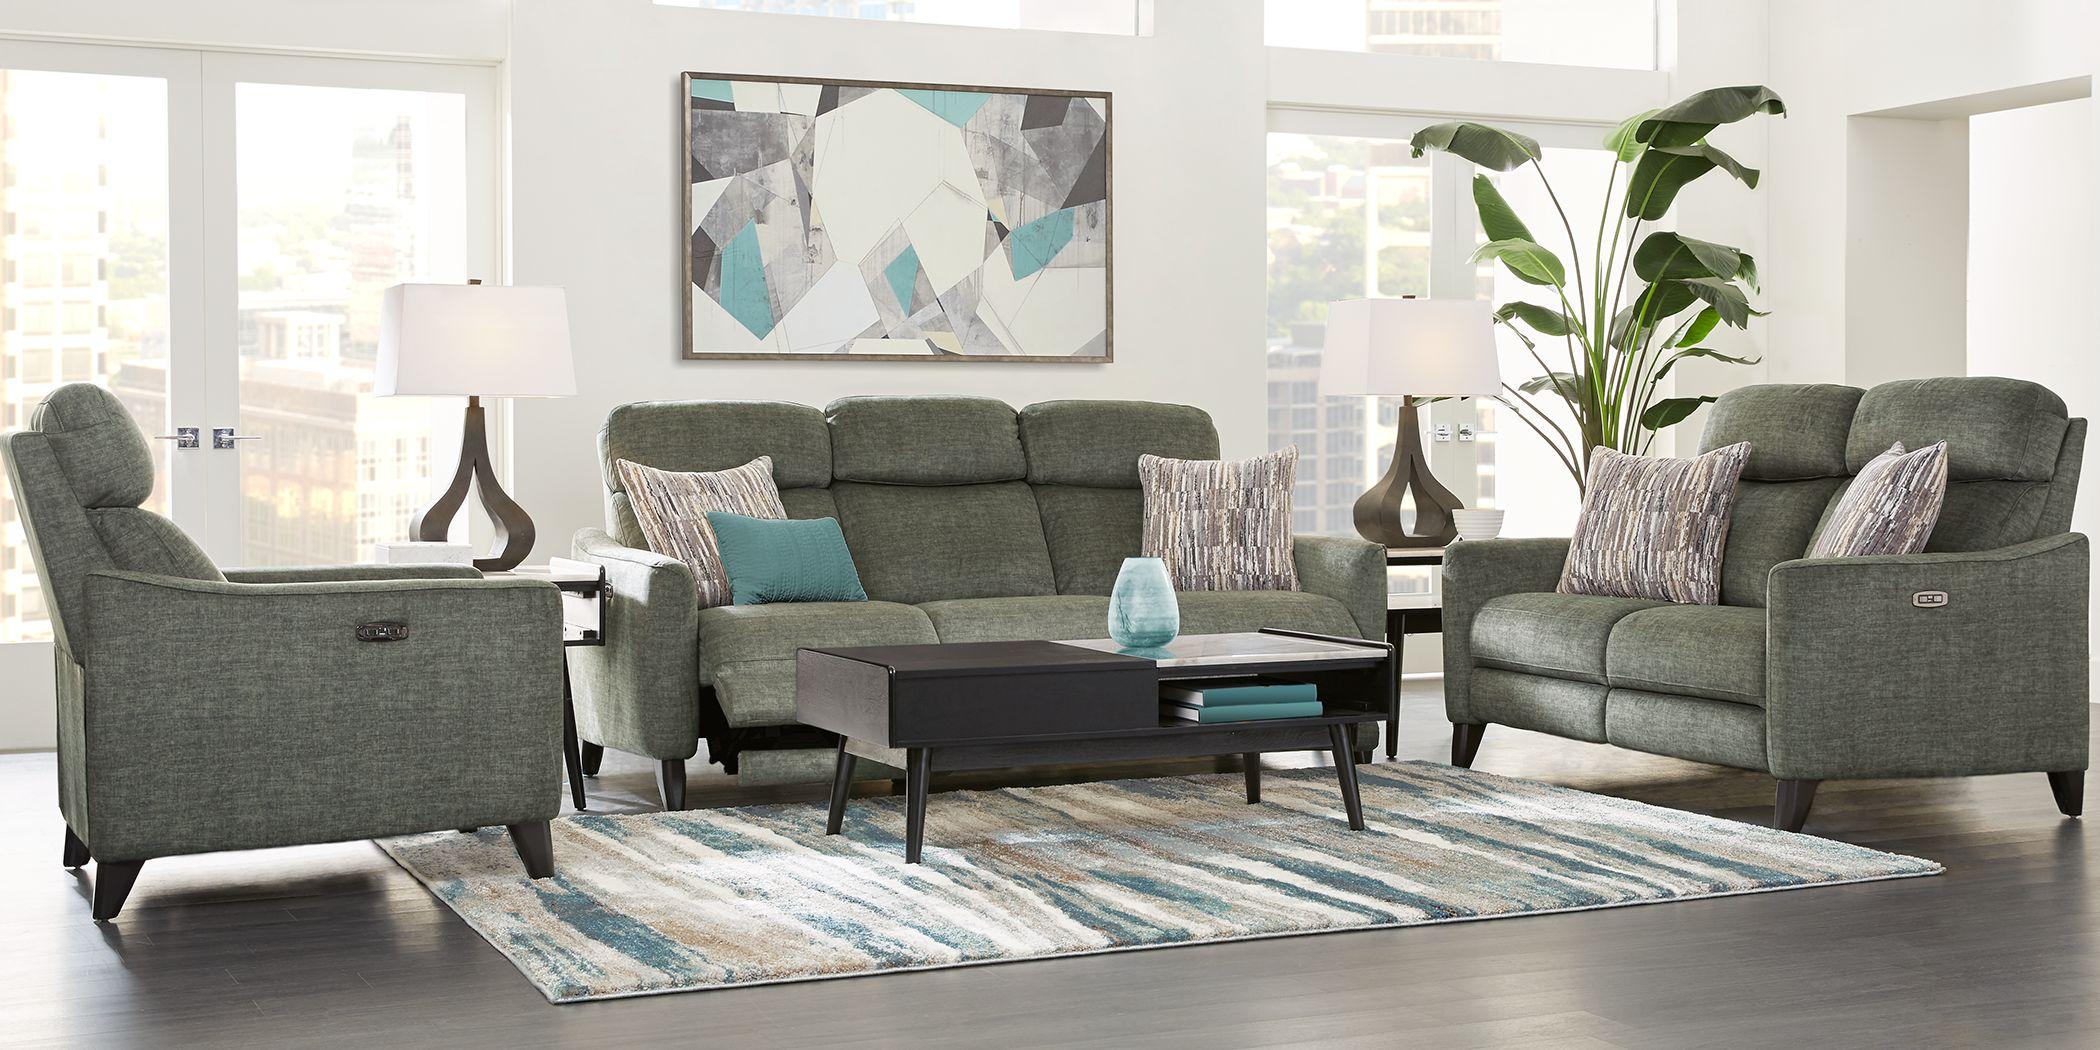 Pierceton Gray 3 Pc Dual Power Reclining Living Room